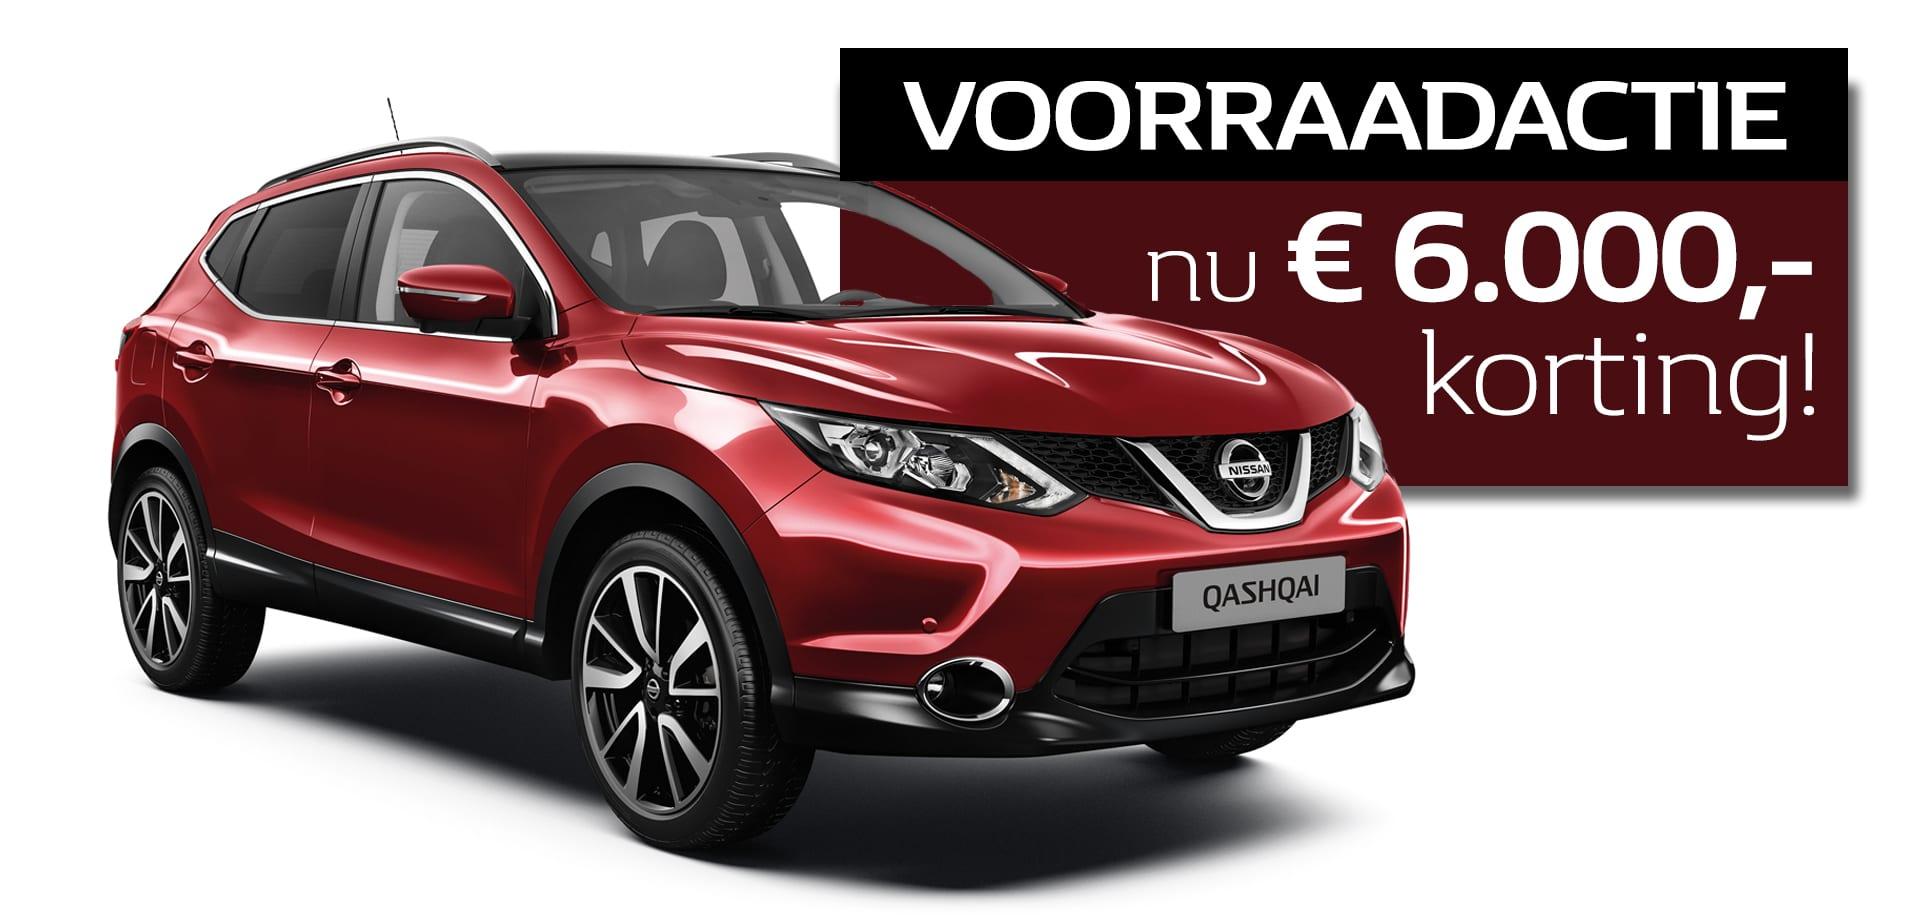 Qashqai 6000 euro korting